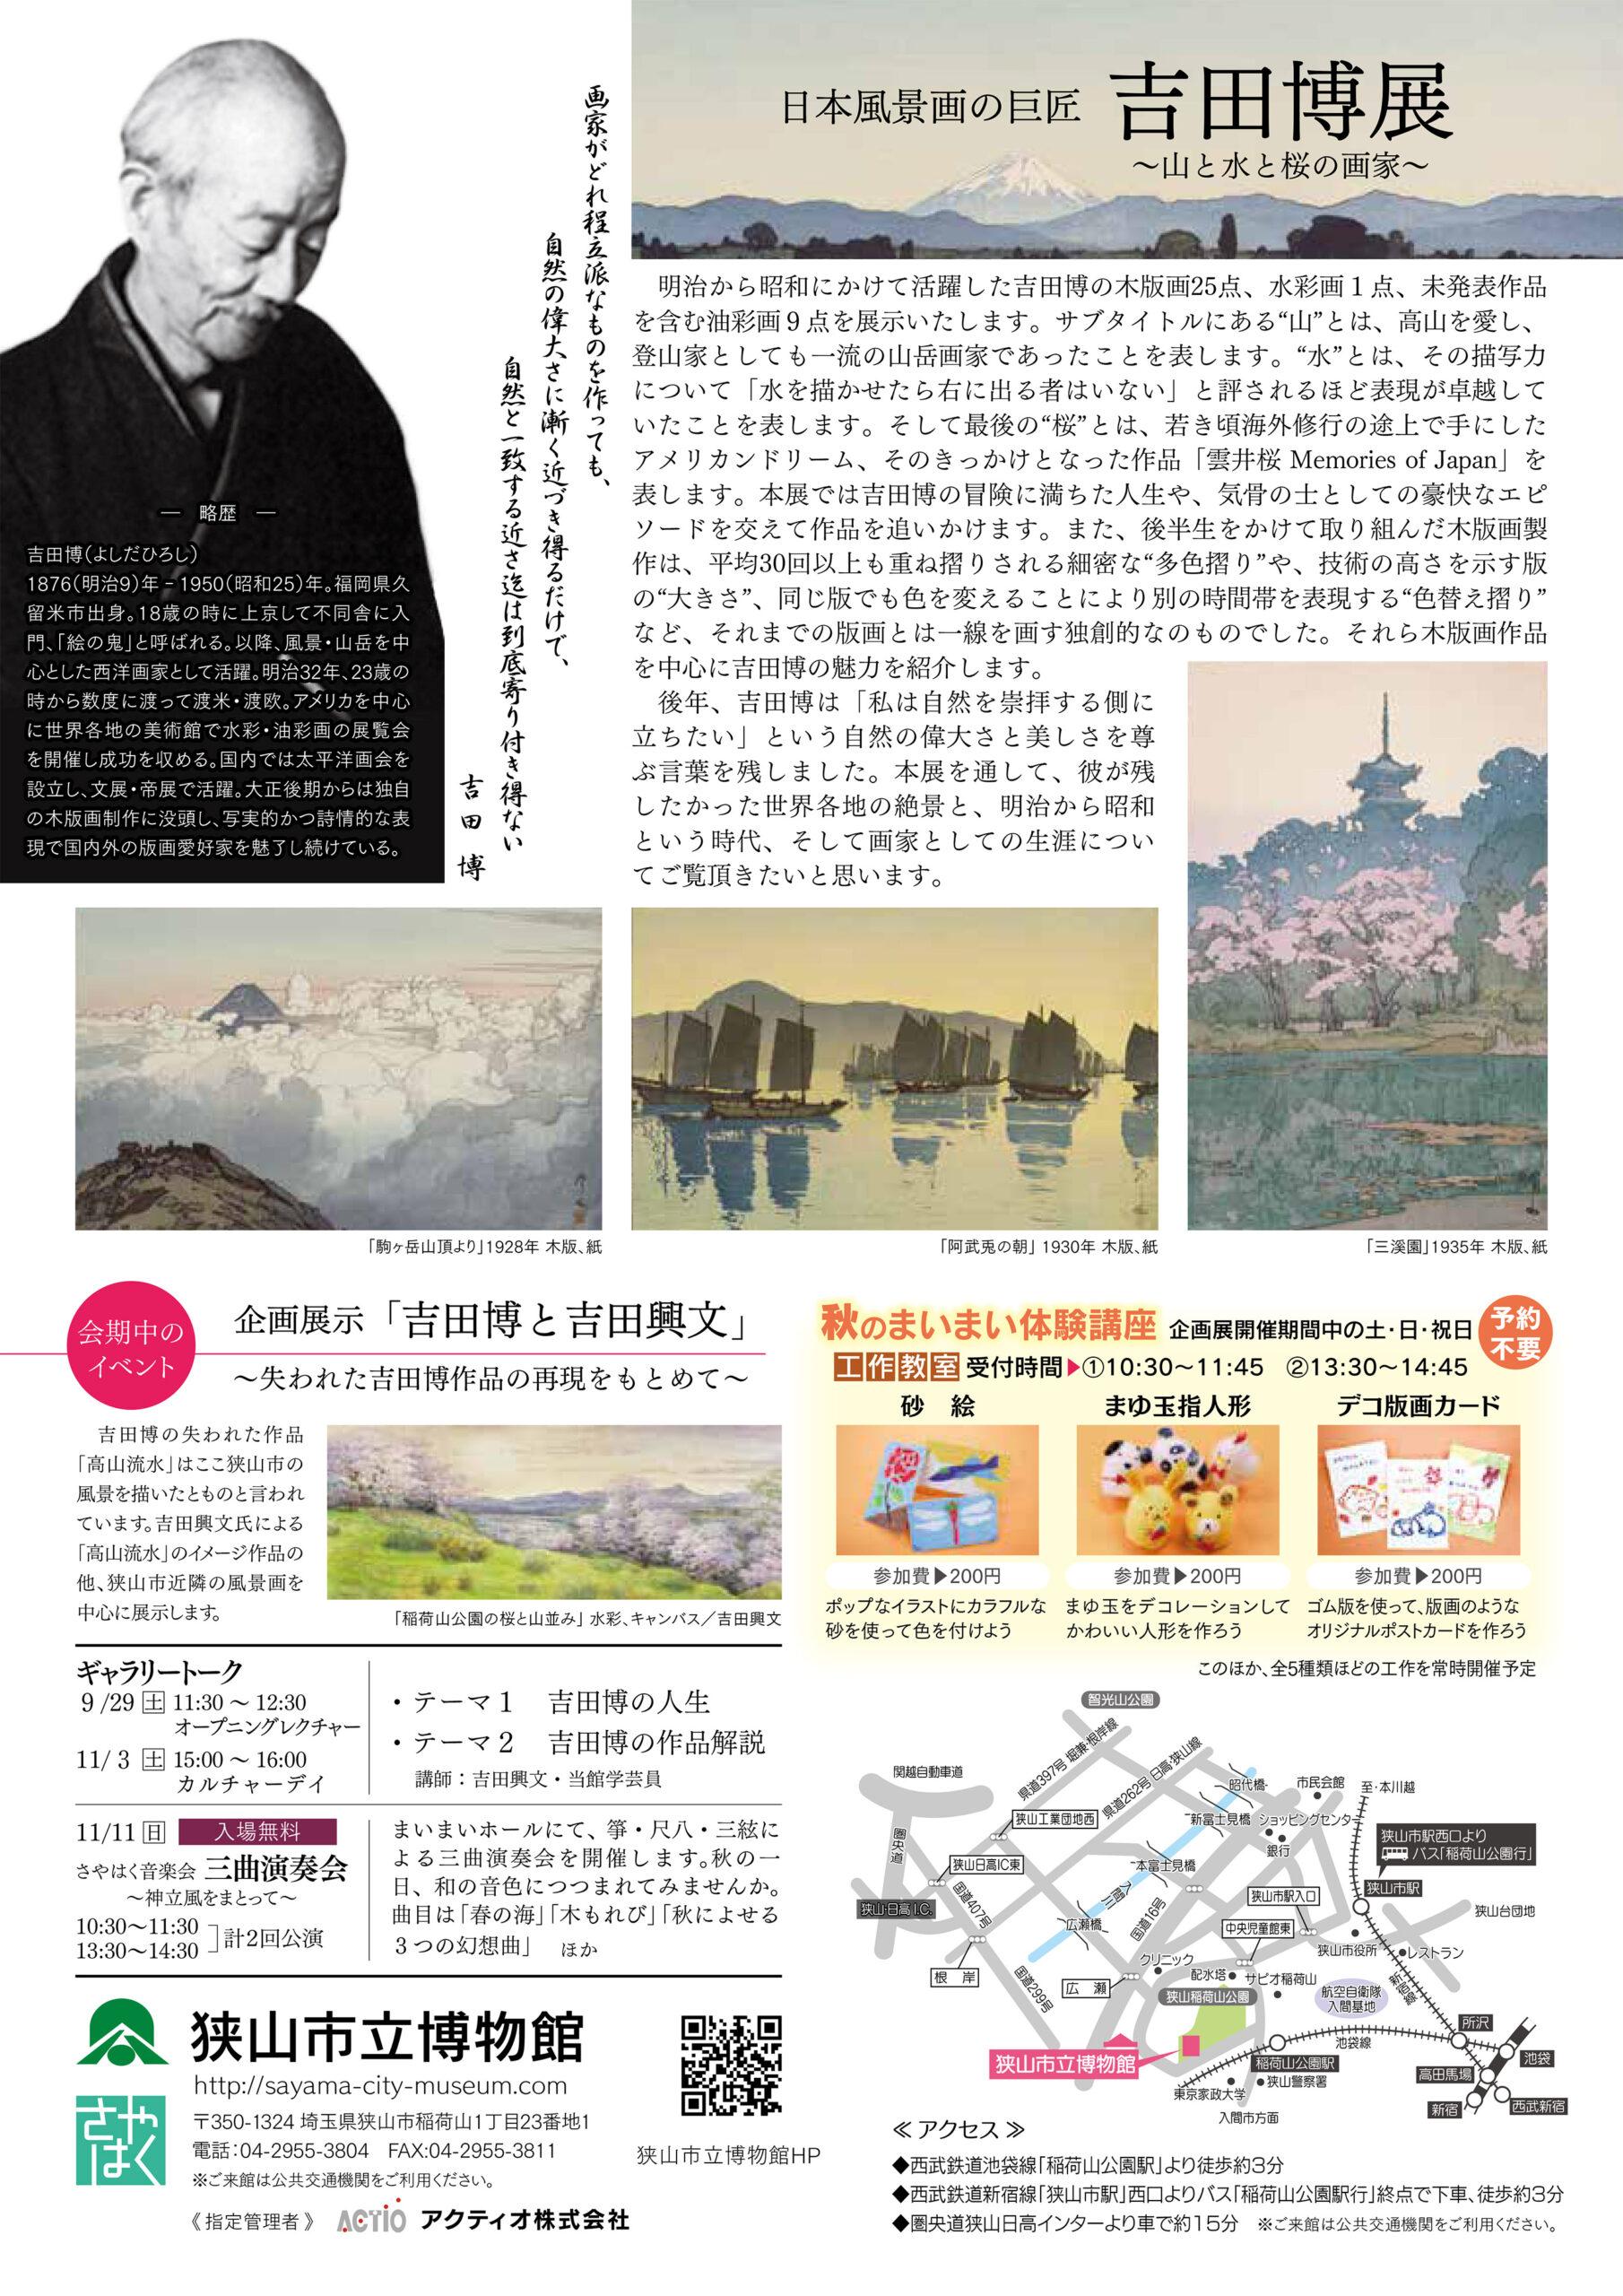 平成30年度 秋期企画展「日本風景画の巨匠 吉田博展 ~山と水と桜の画家~」